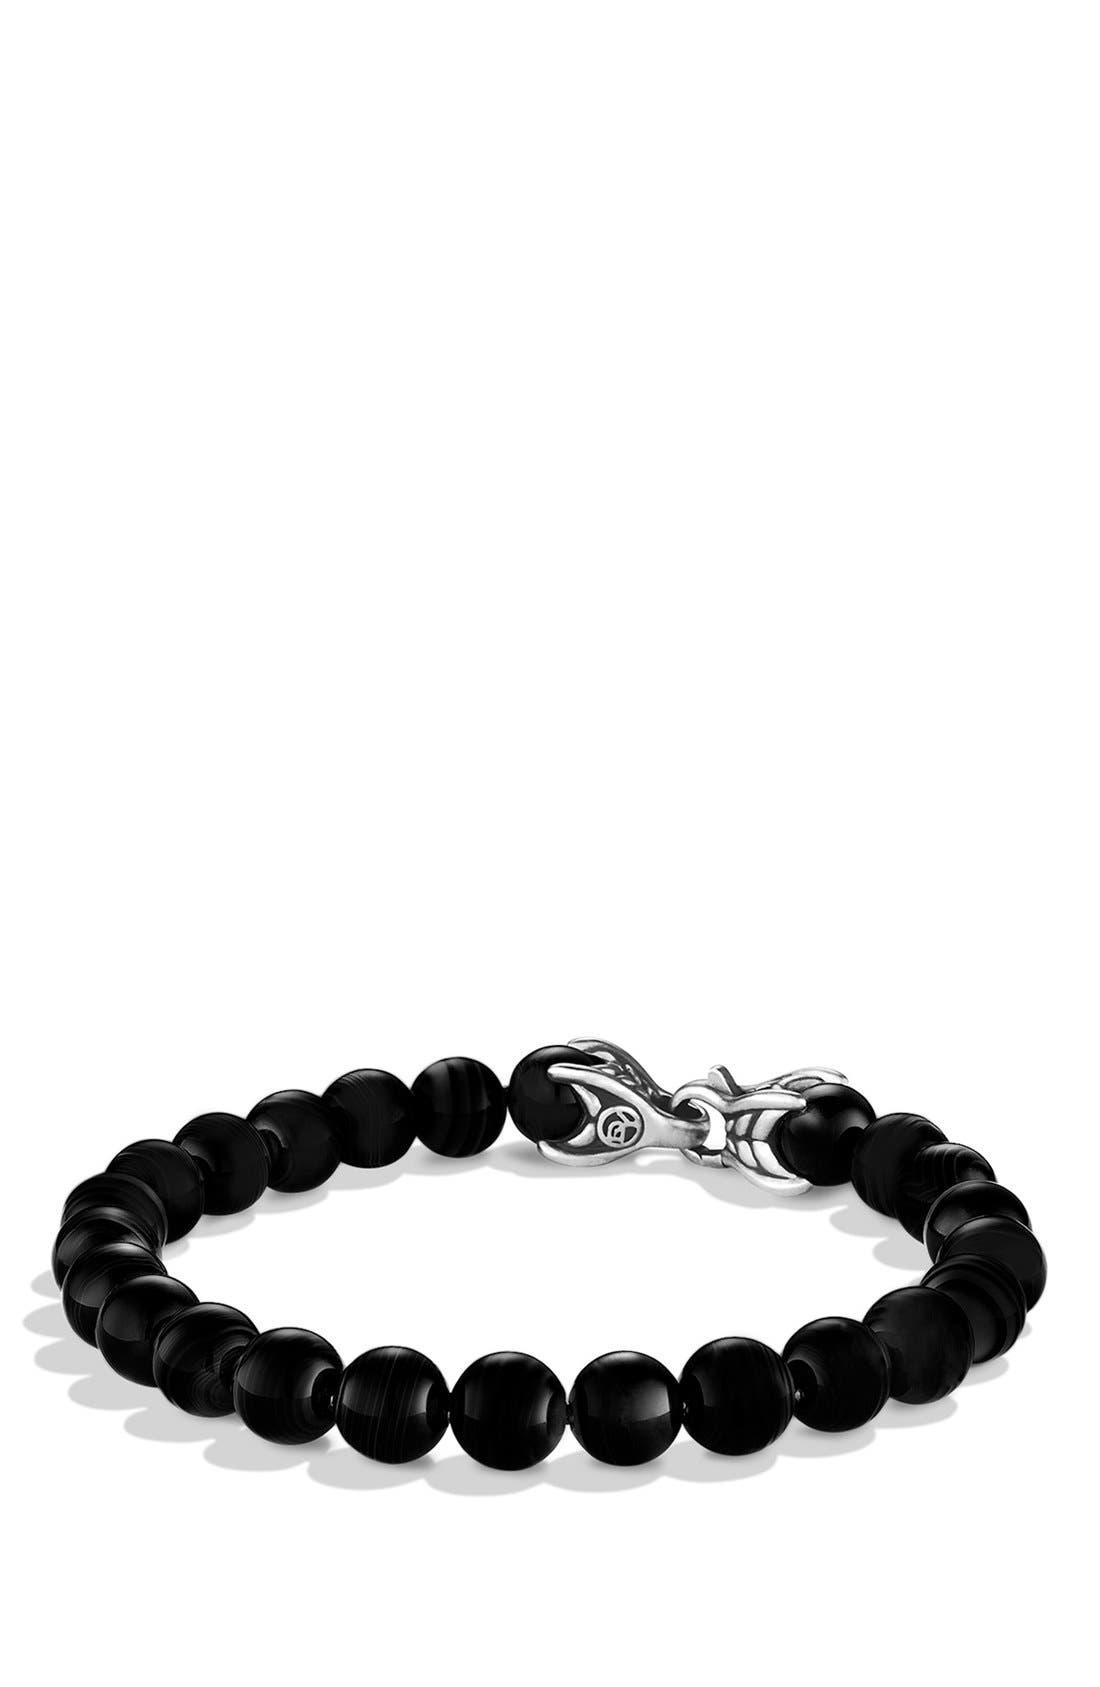 DAVID YURMAN Spiritual Beads Bracelet